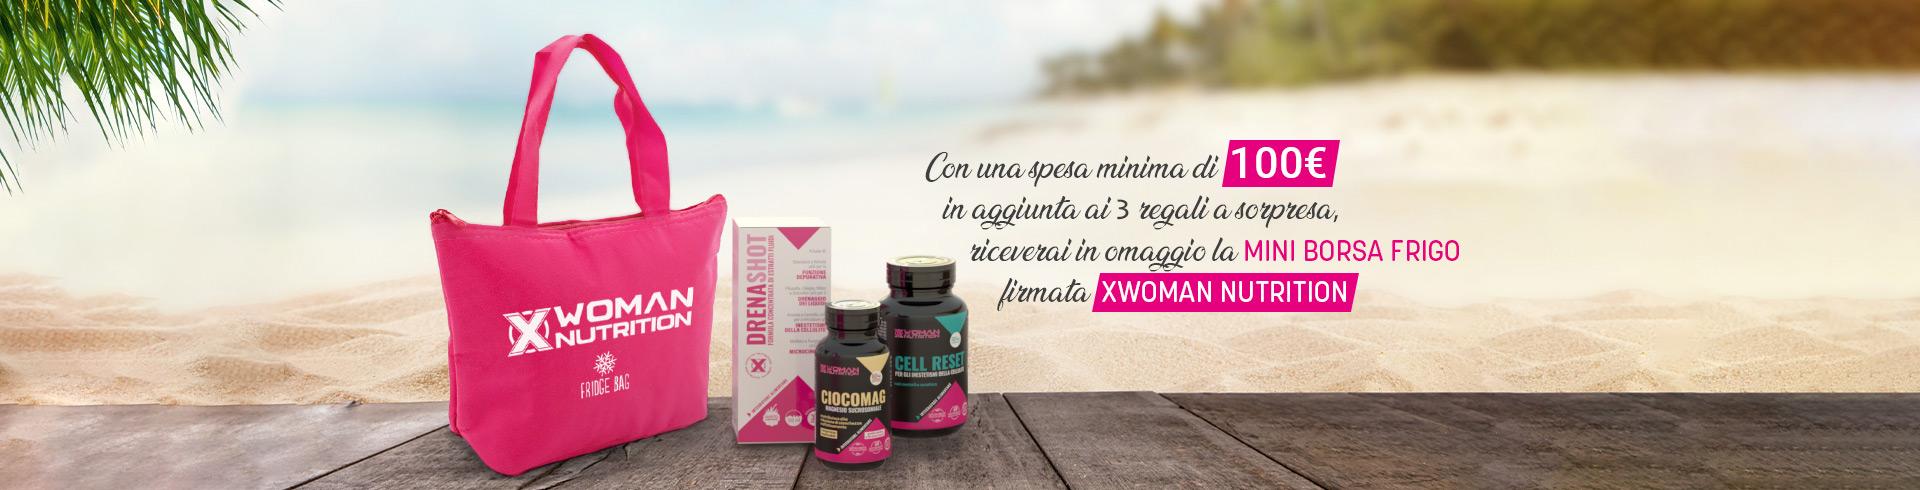 Slide Promo Borsa Frigo - XWoman Nutrition